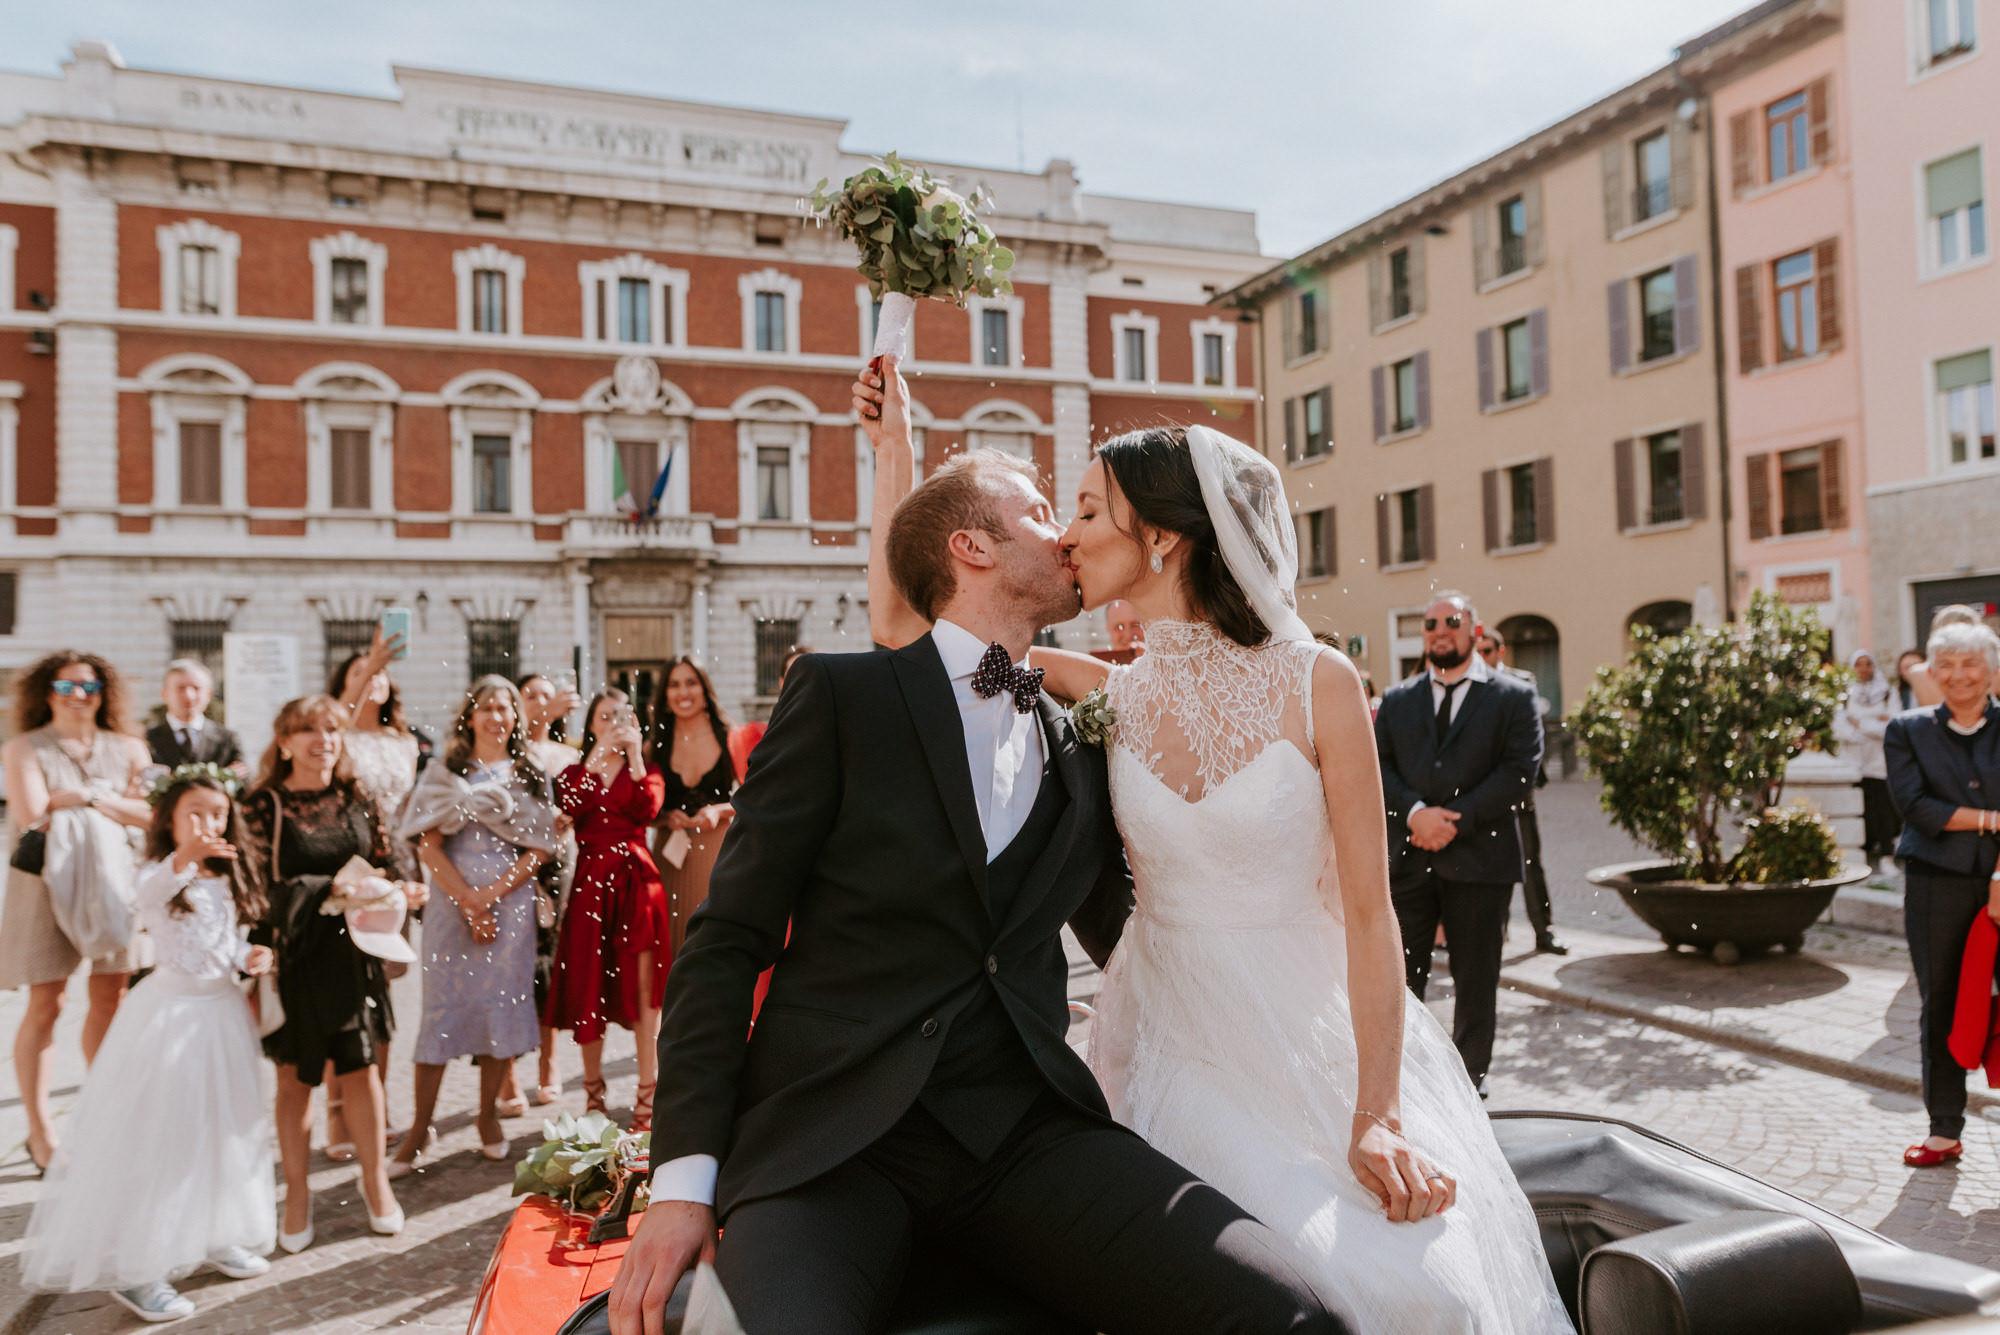 FOTO+PHOTO+BODA+WEDDING+ITALIA+ITALY+MAURICIO+GARAY+MAURICIOGARAY+WEDDINPHOTOGRAPHER+FOTOGRAFODEBODA-1097.jpg